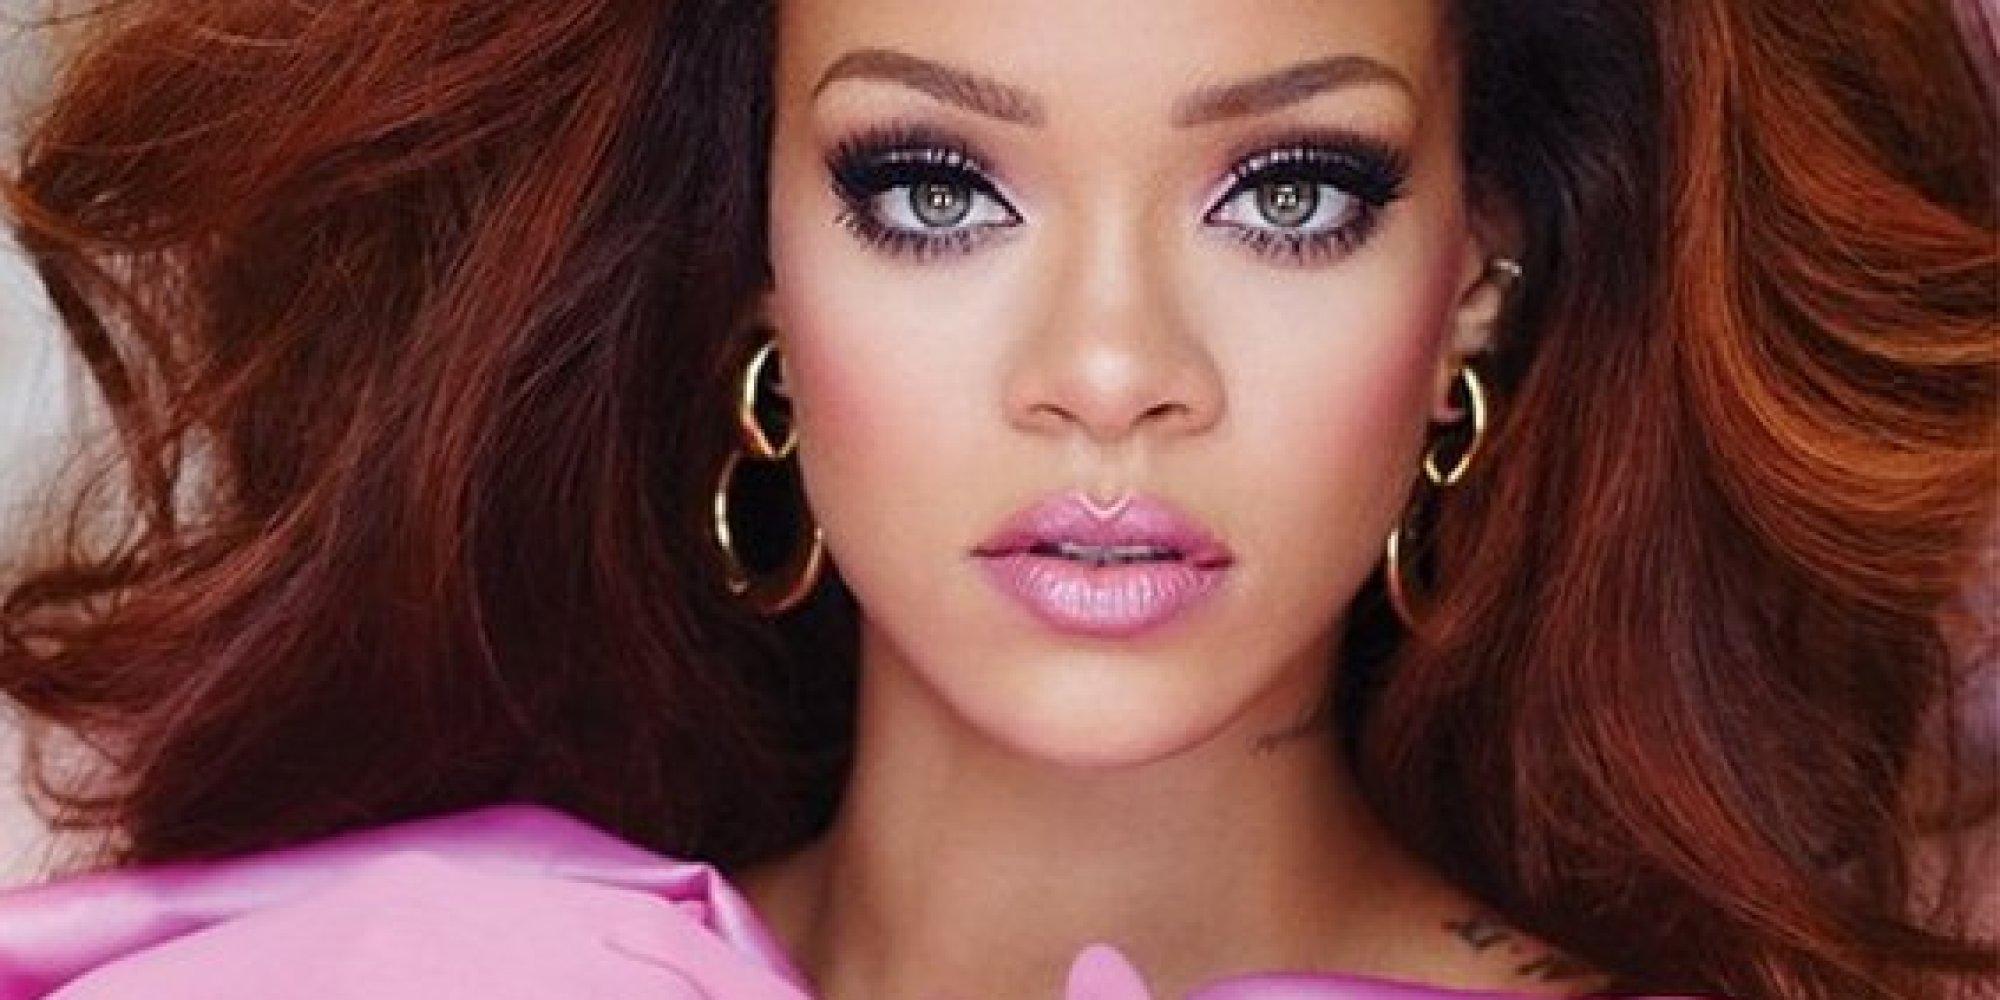 Rihanna number one singles uk dating 2